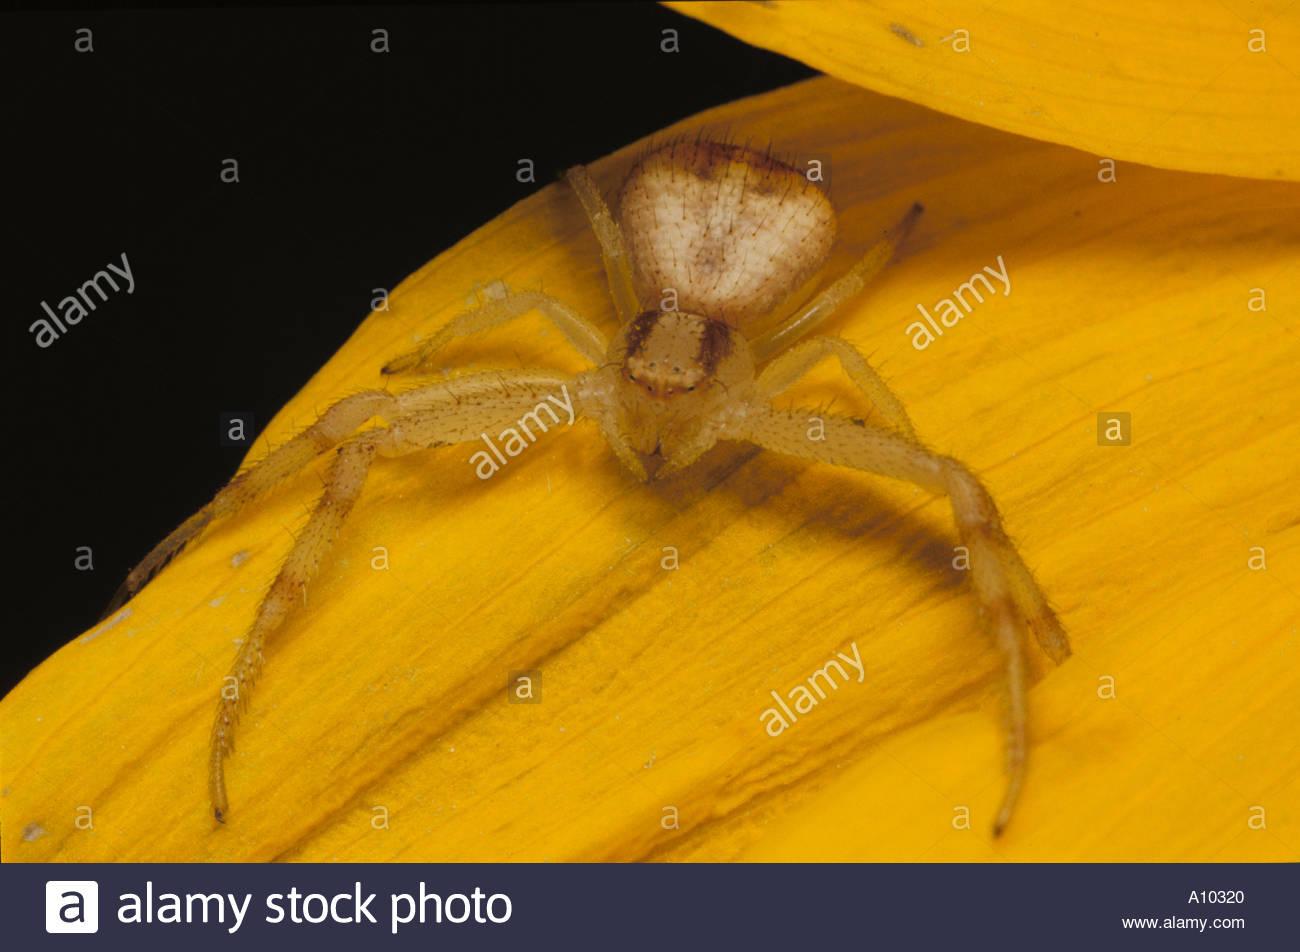 Yellow Crab Spider Misumena or similar genus - Stock Image